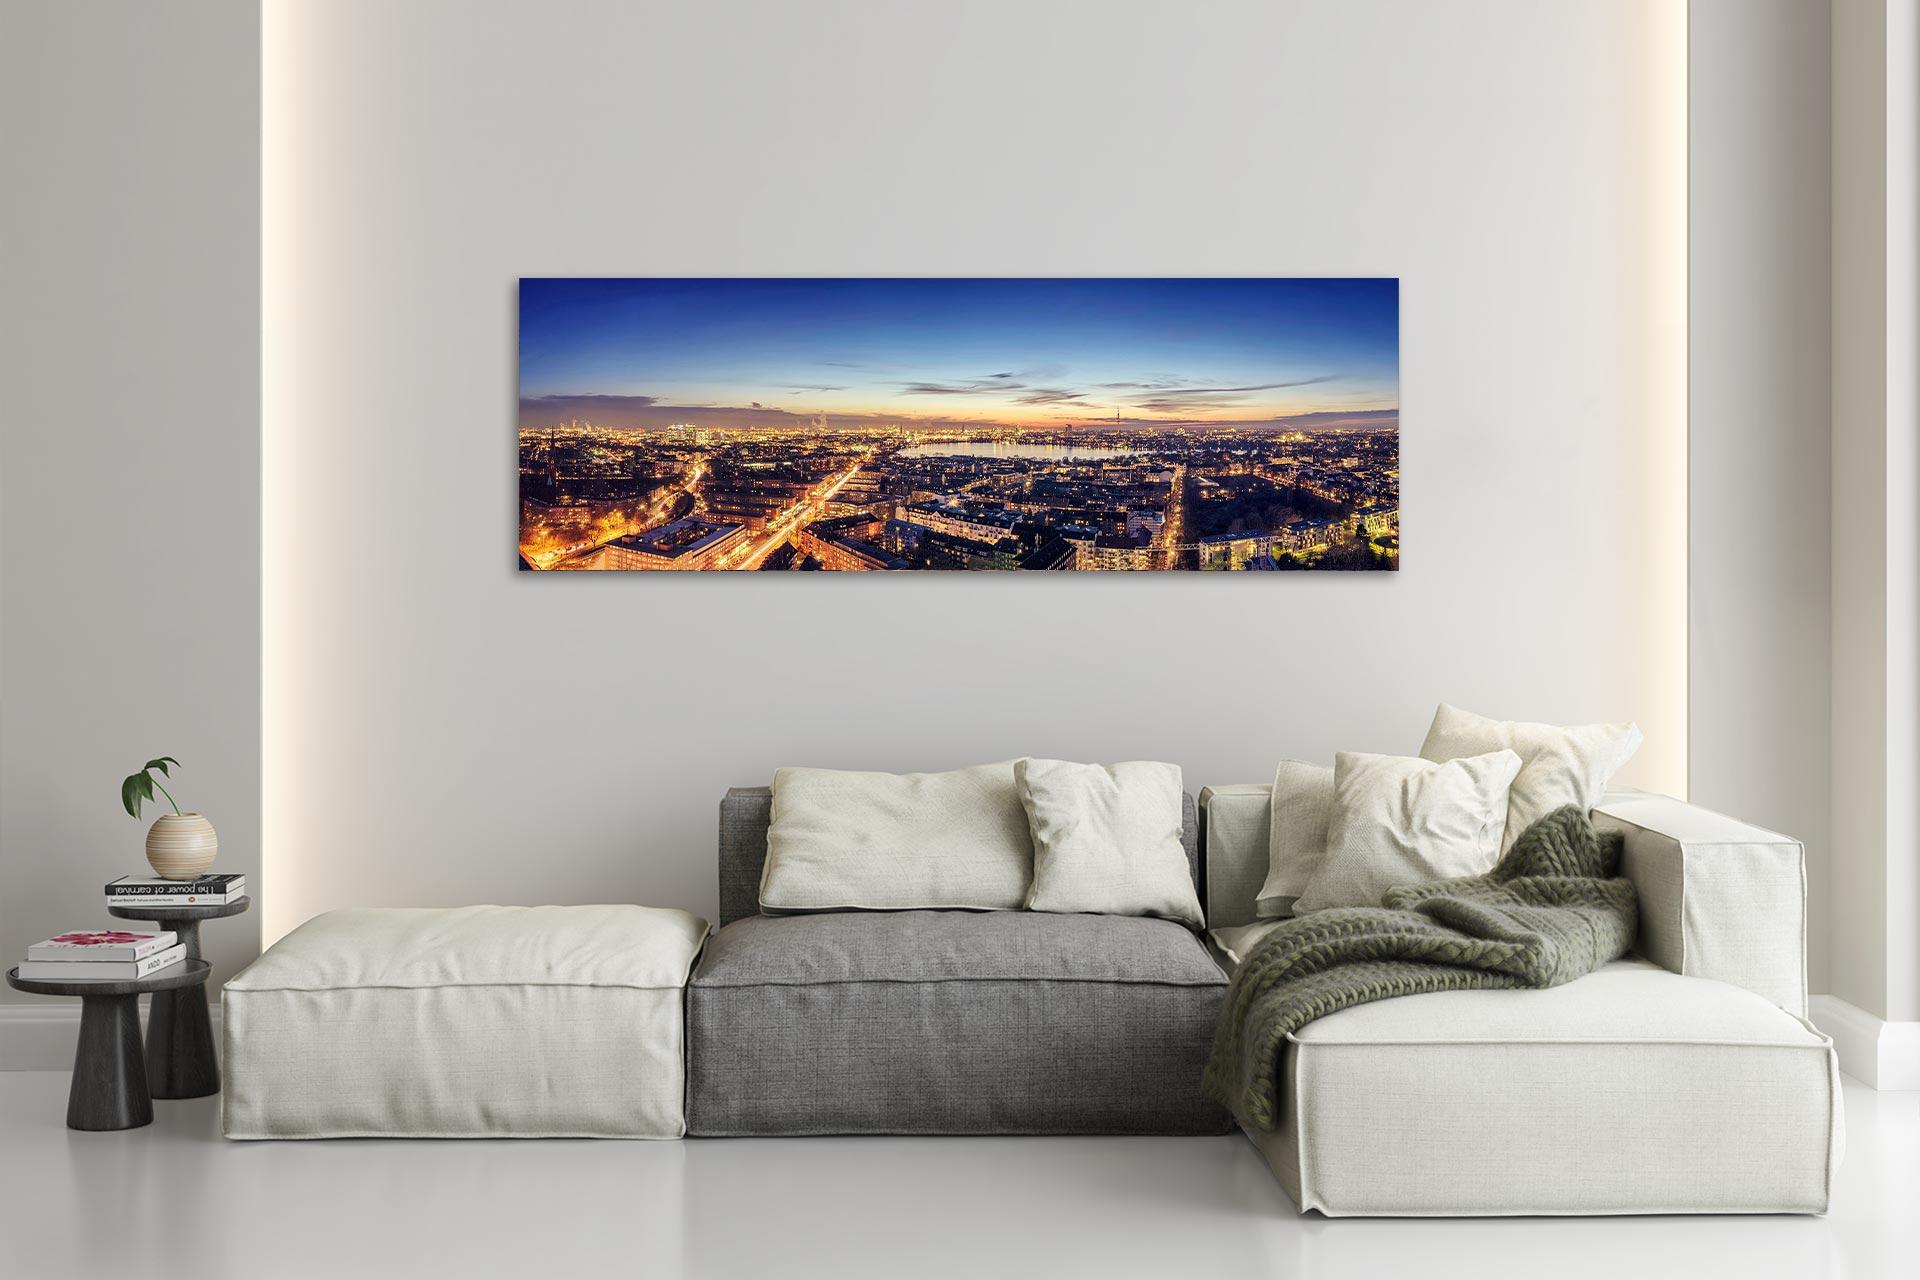 TG312-skyline-hamburg-wandbild-auf-leinwand-acrylglas-aludibond-wohnzimmer